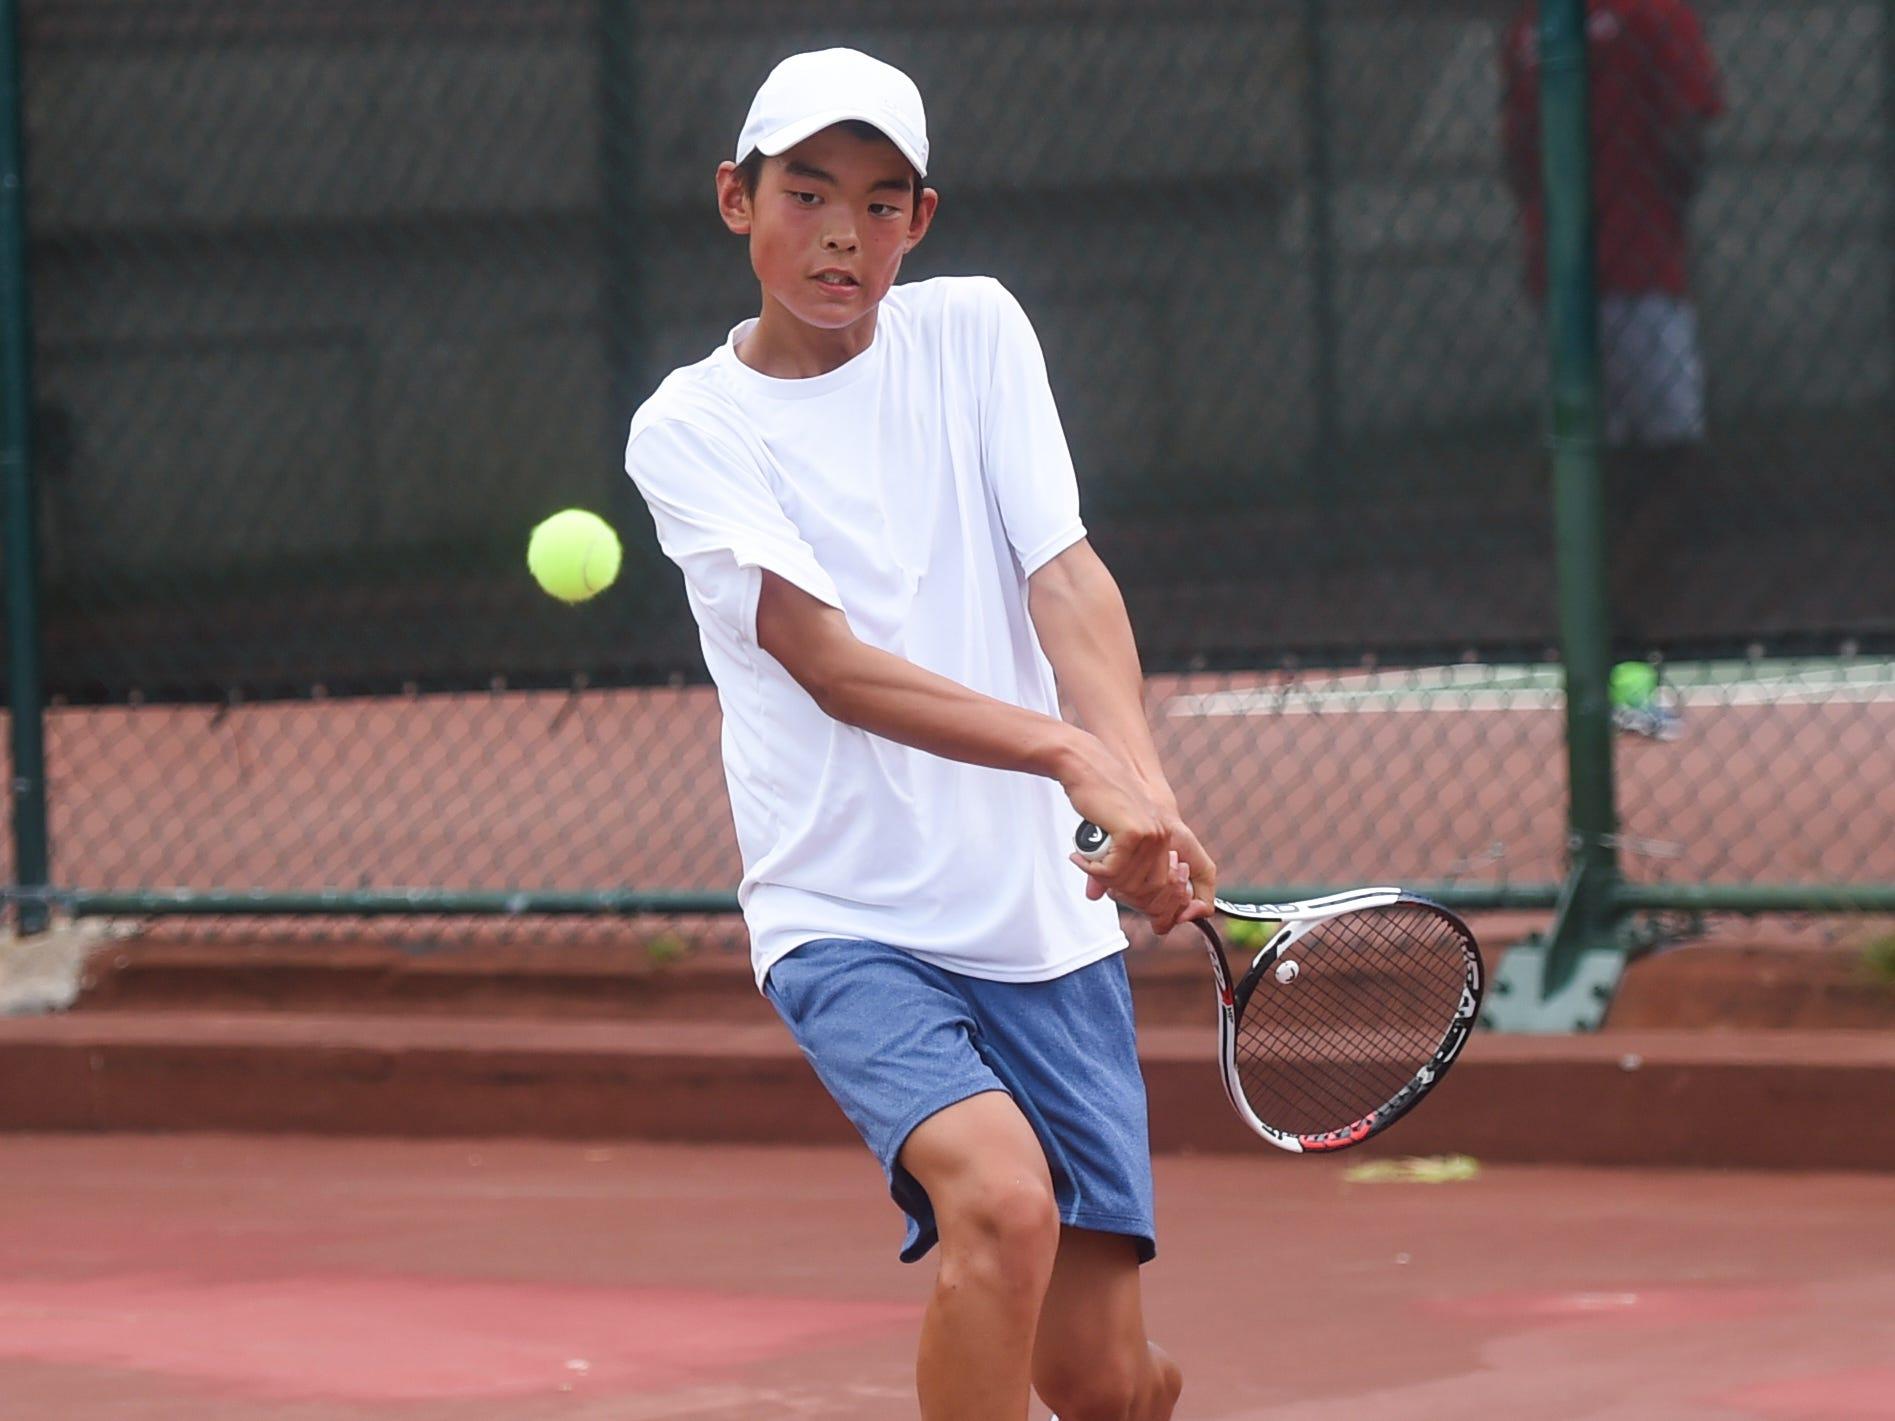 Kohdai Sasaki during a 2019 Chuck E Cheese ITF World Tennis Tour Juniors qualifying match at the Hilton Guam Resort and Spa in Tumon, May 12, 2019.